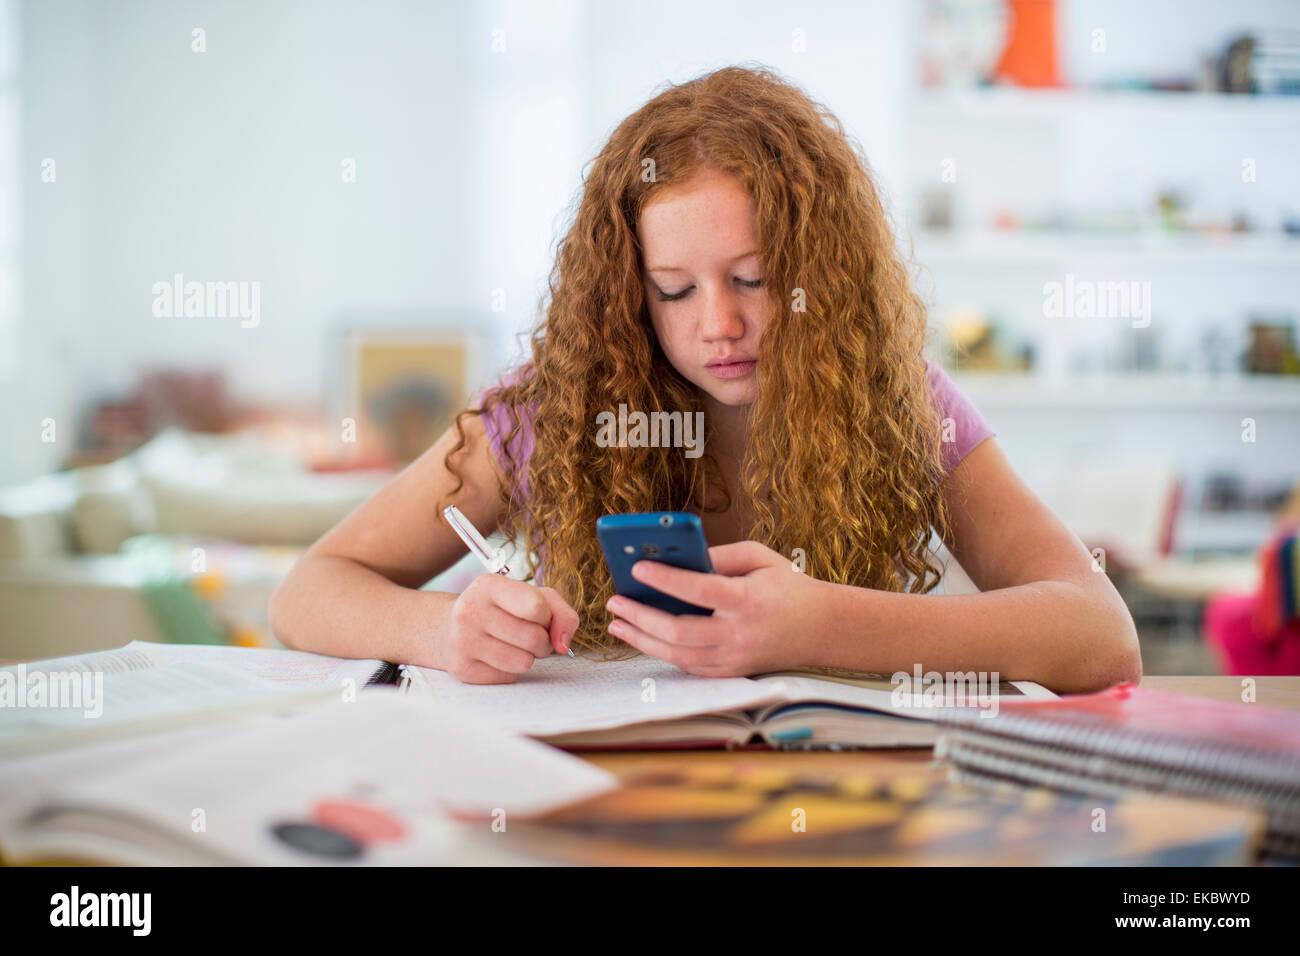 Teenage girl writing notes et using smartphone Photo Stock